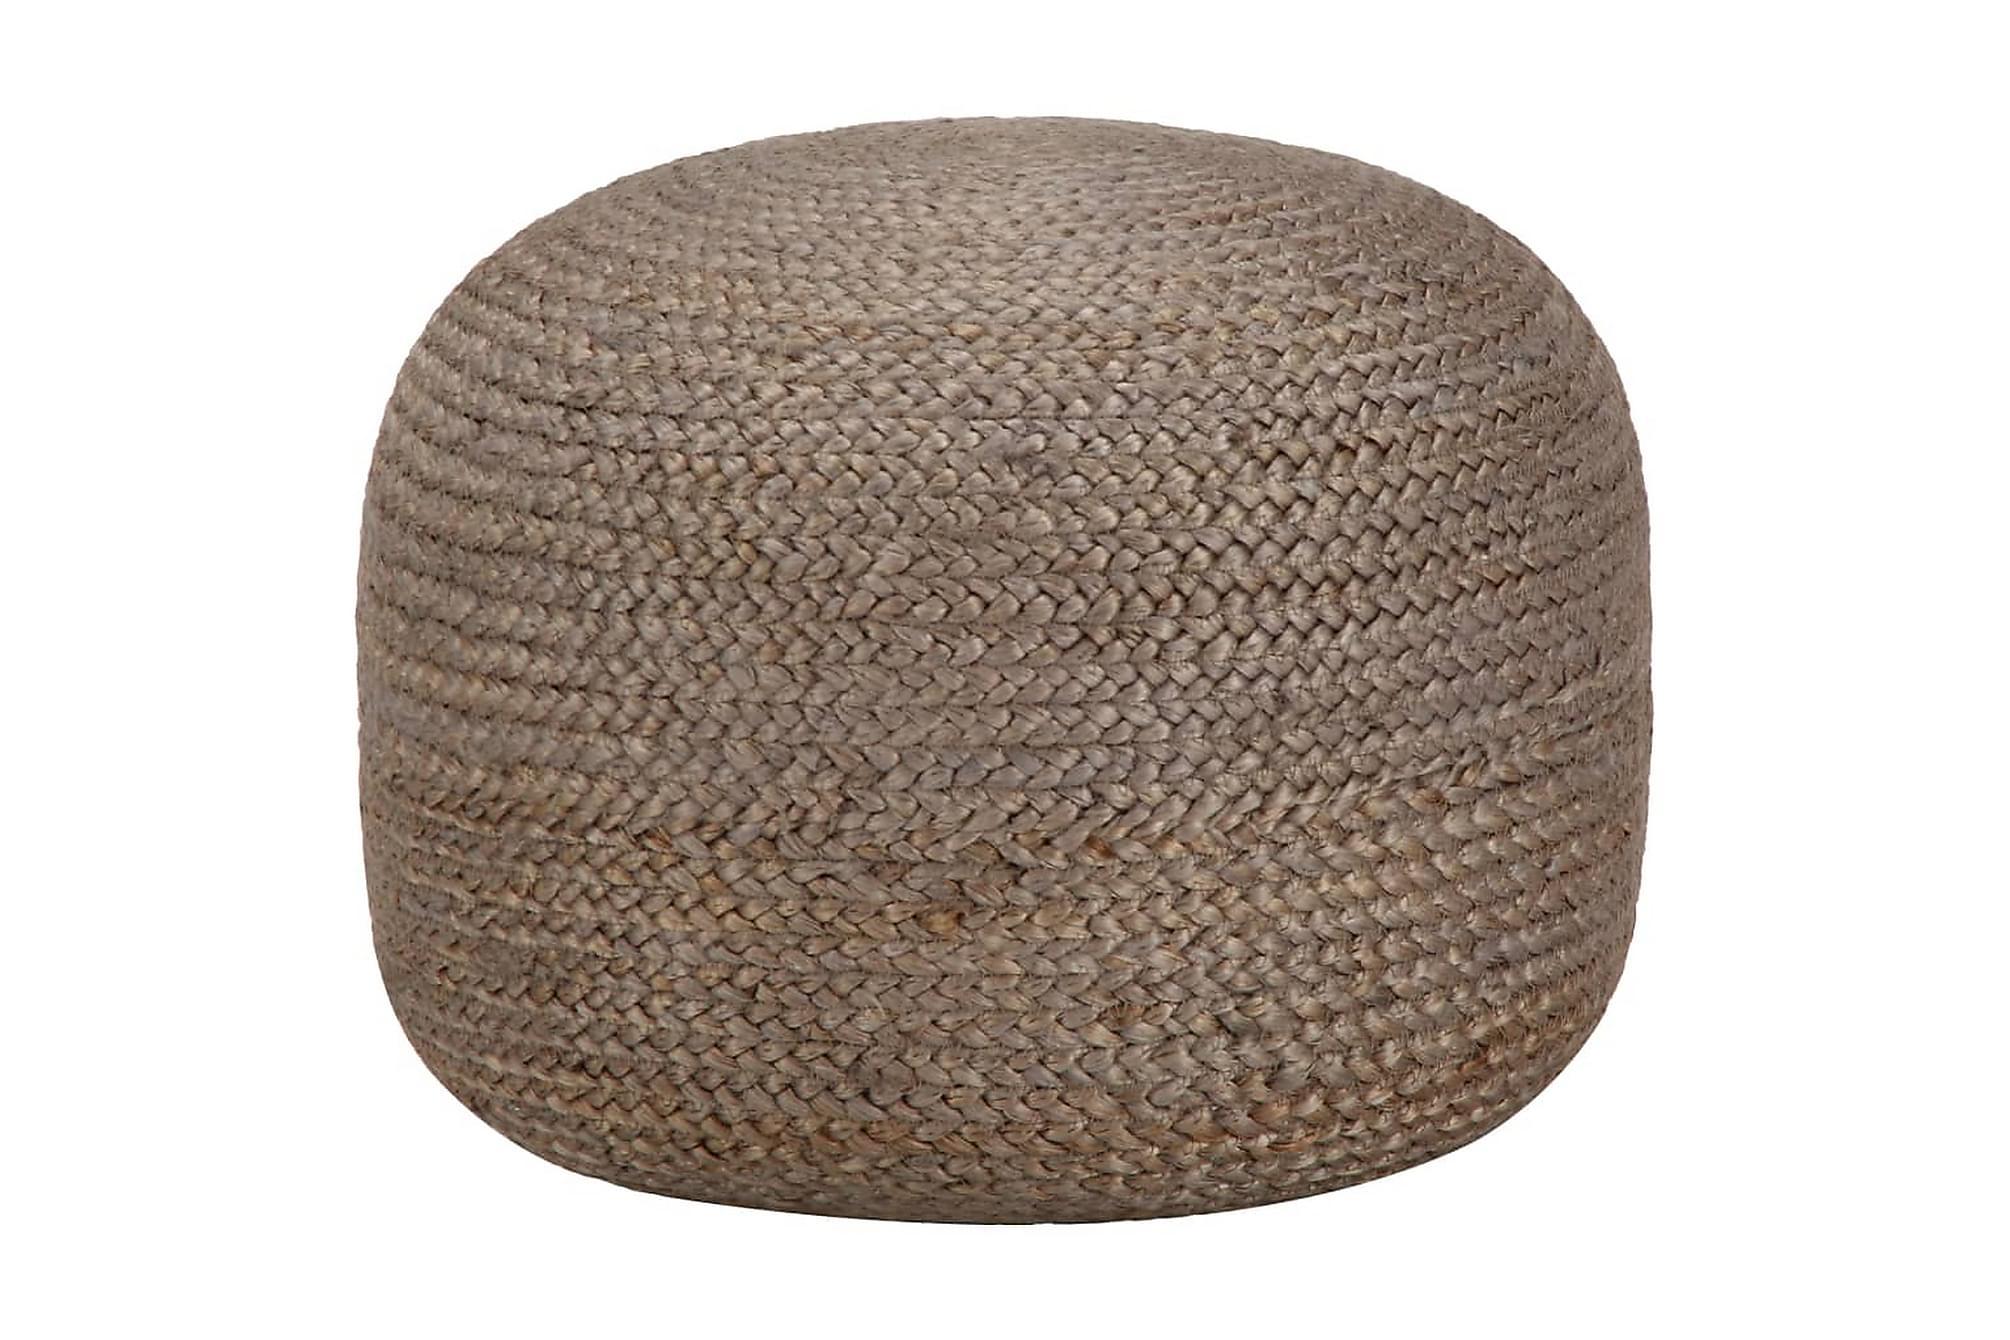 Handgjord sittpuff ljusgrå 45×30 cm jute